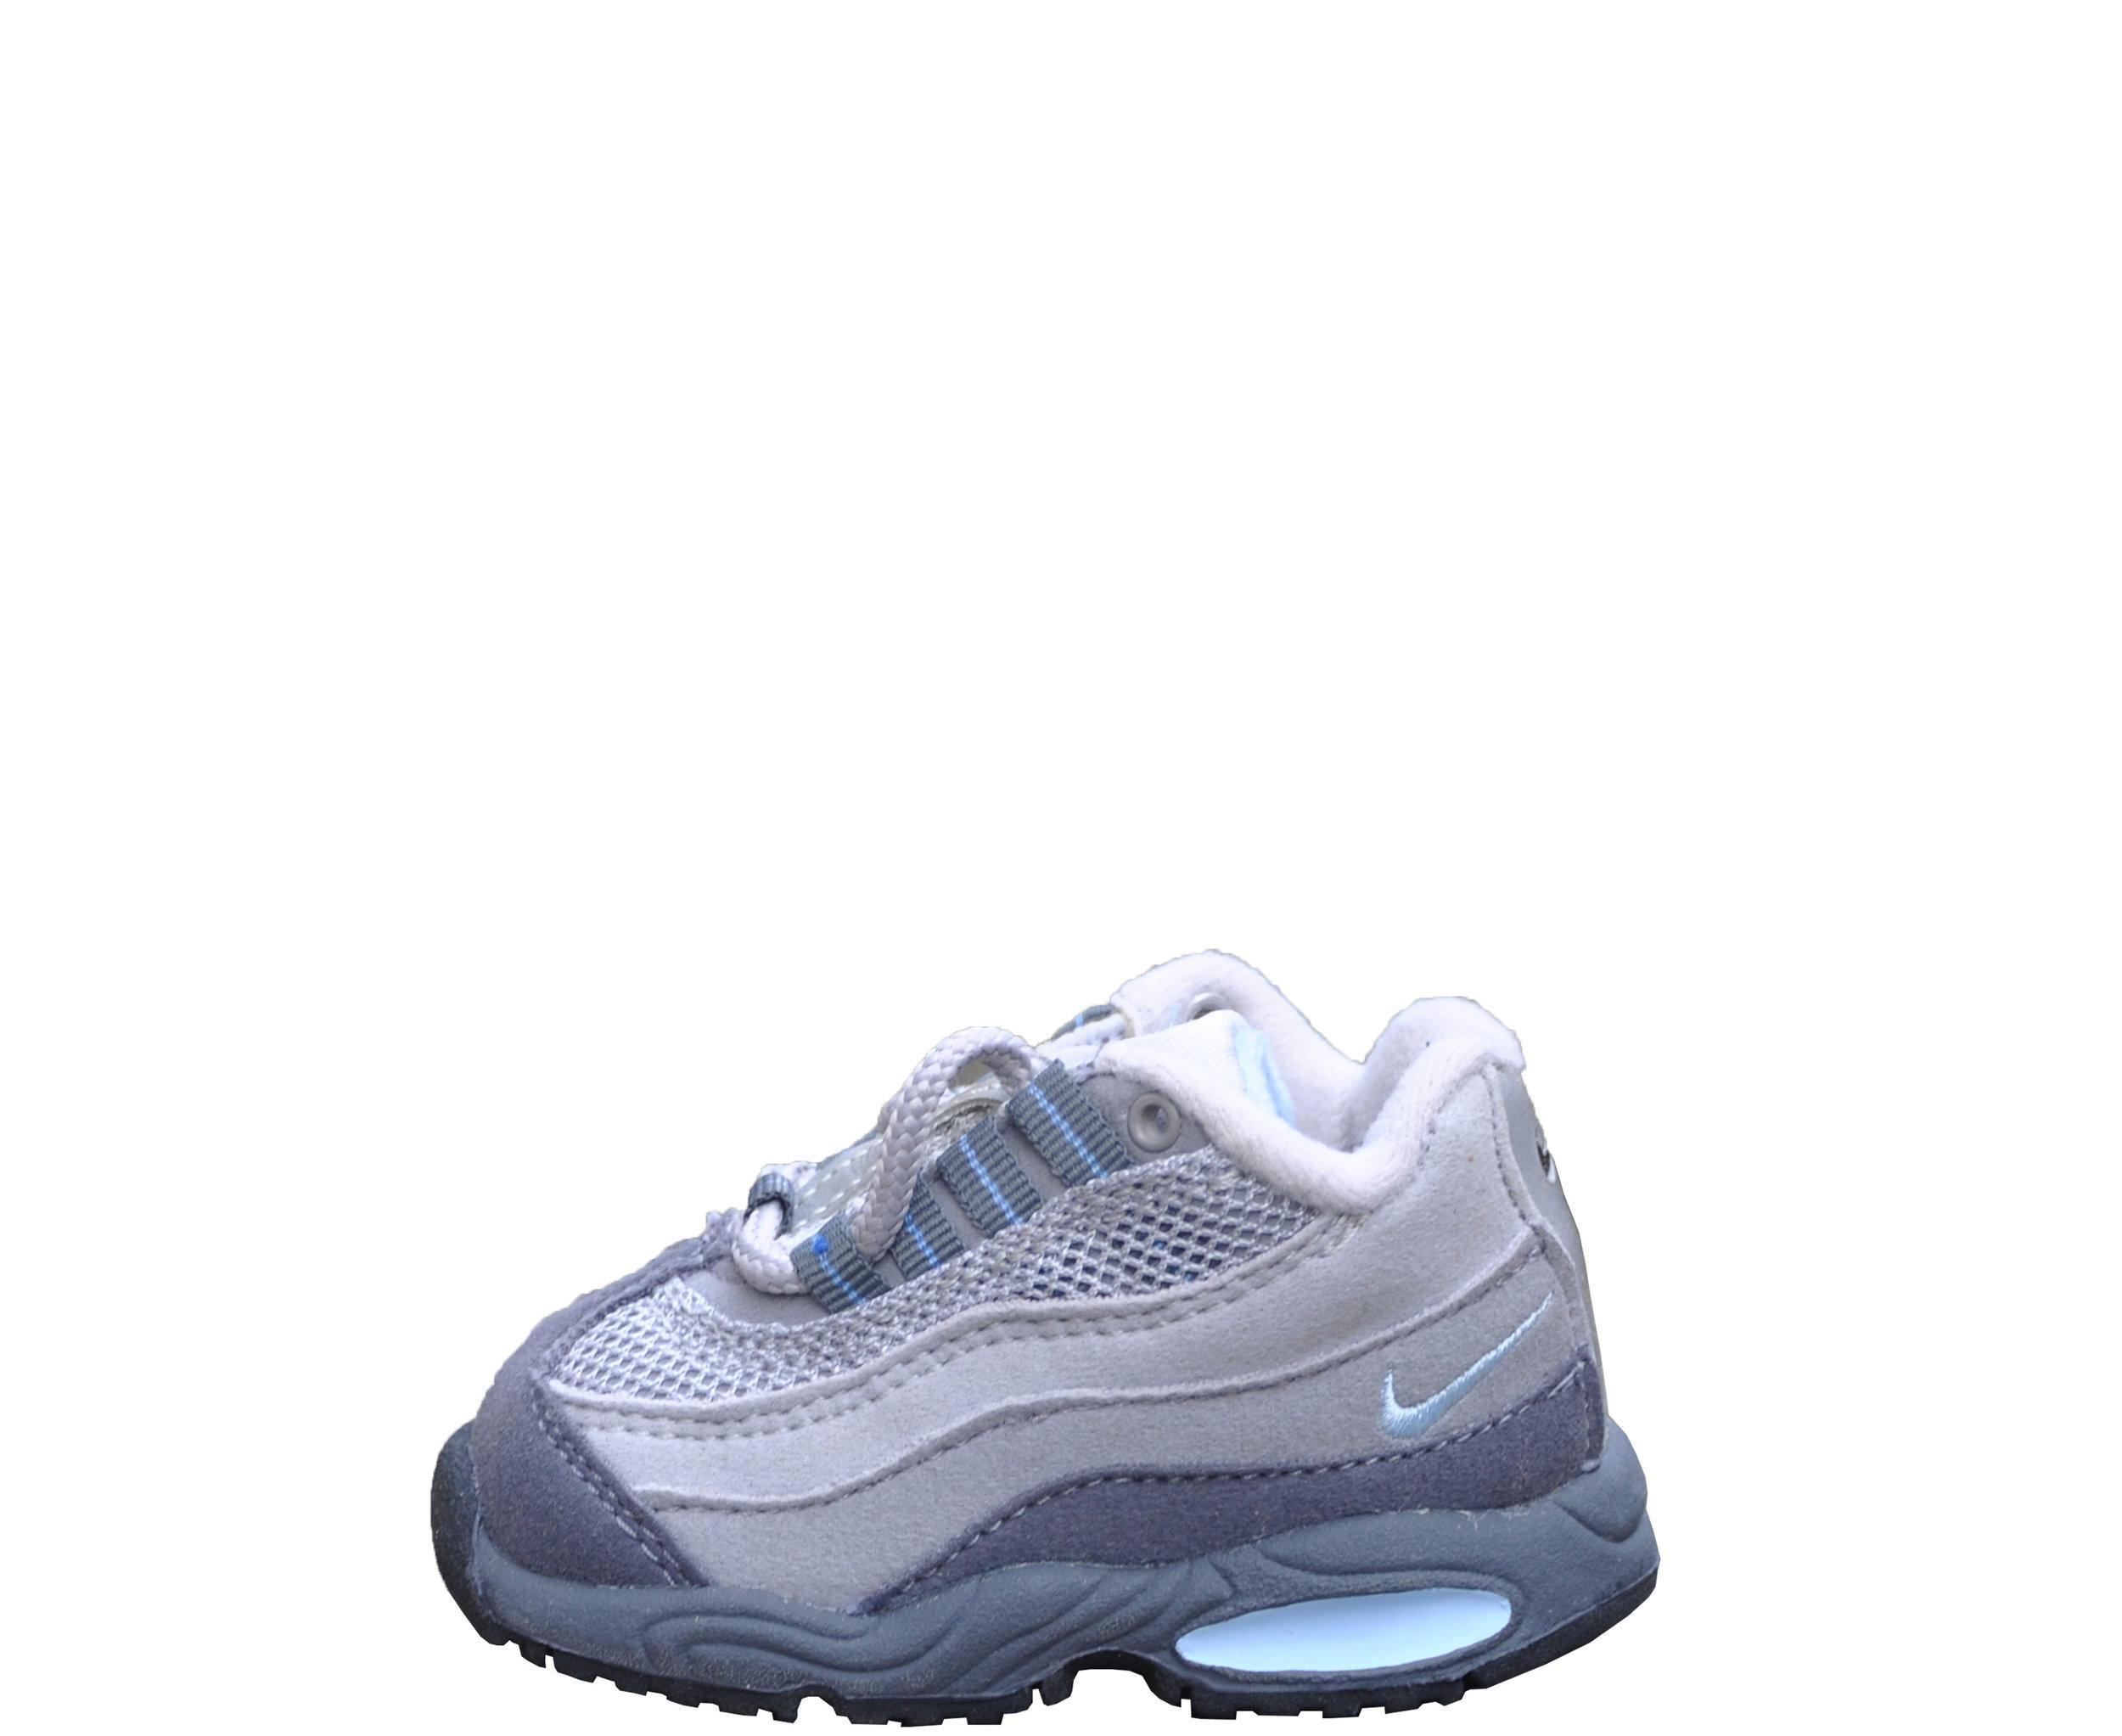 meet 106c2 cf63c Baby Nike Air Max 95 Heaven Blue DS — Roots